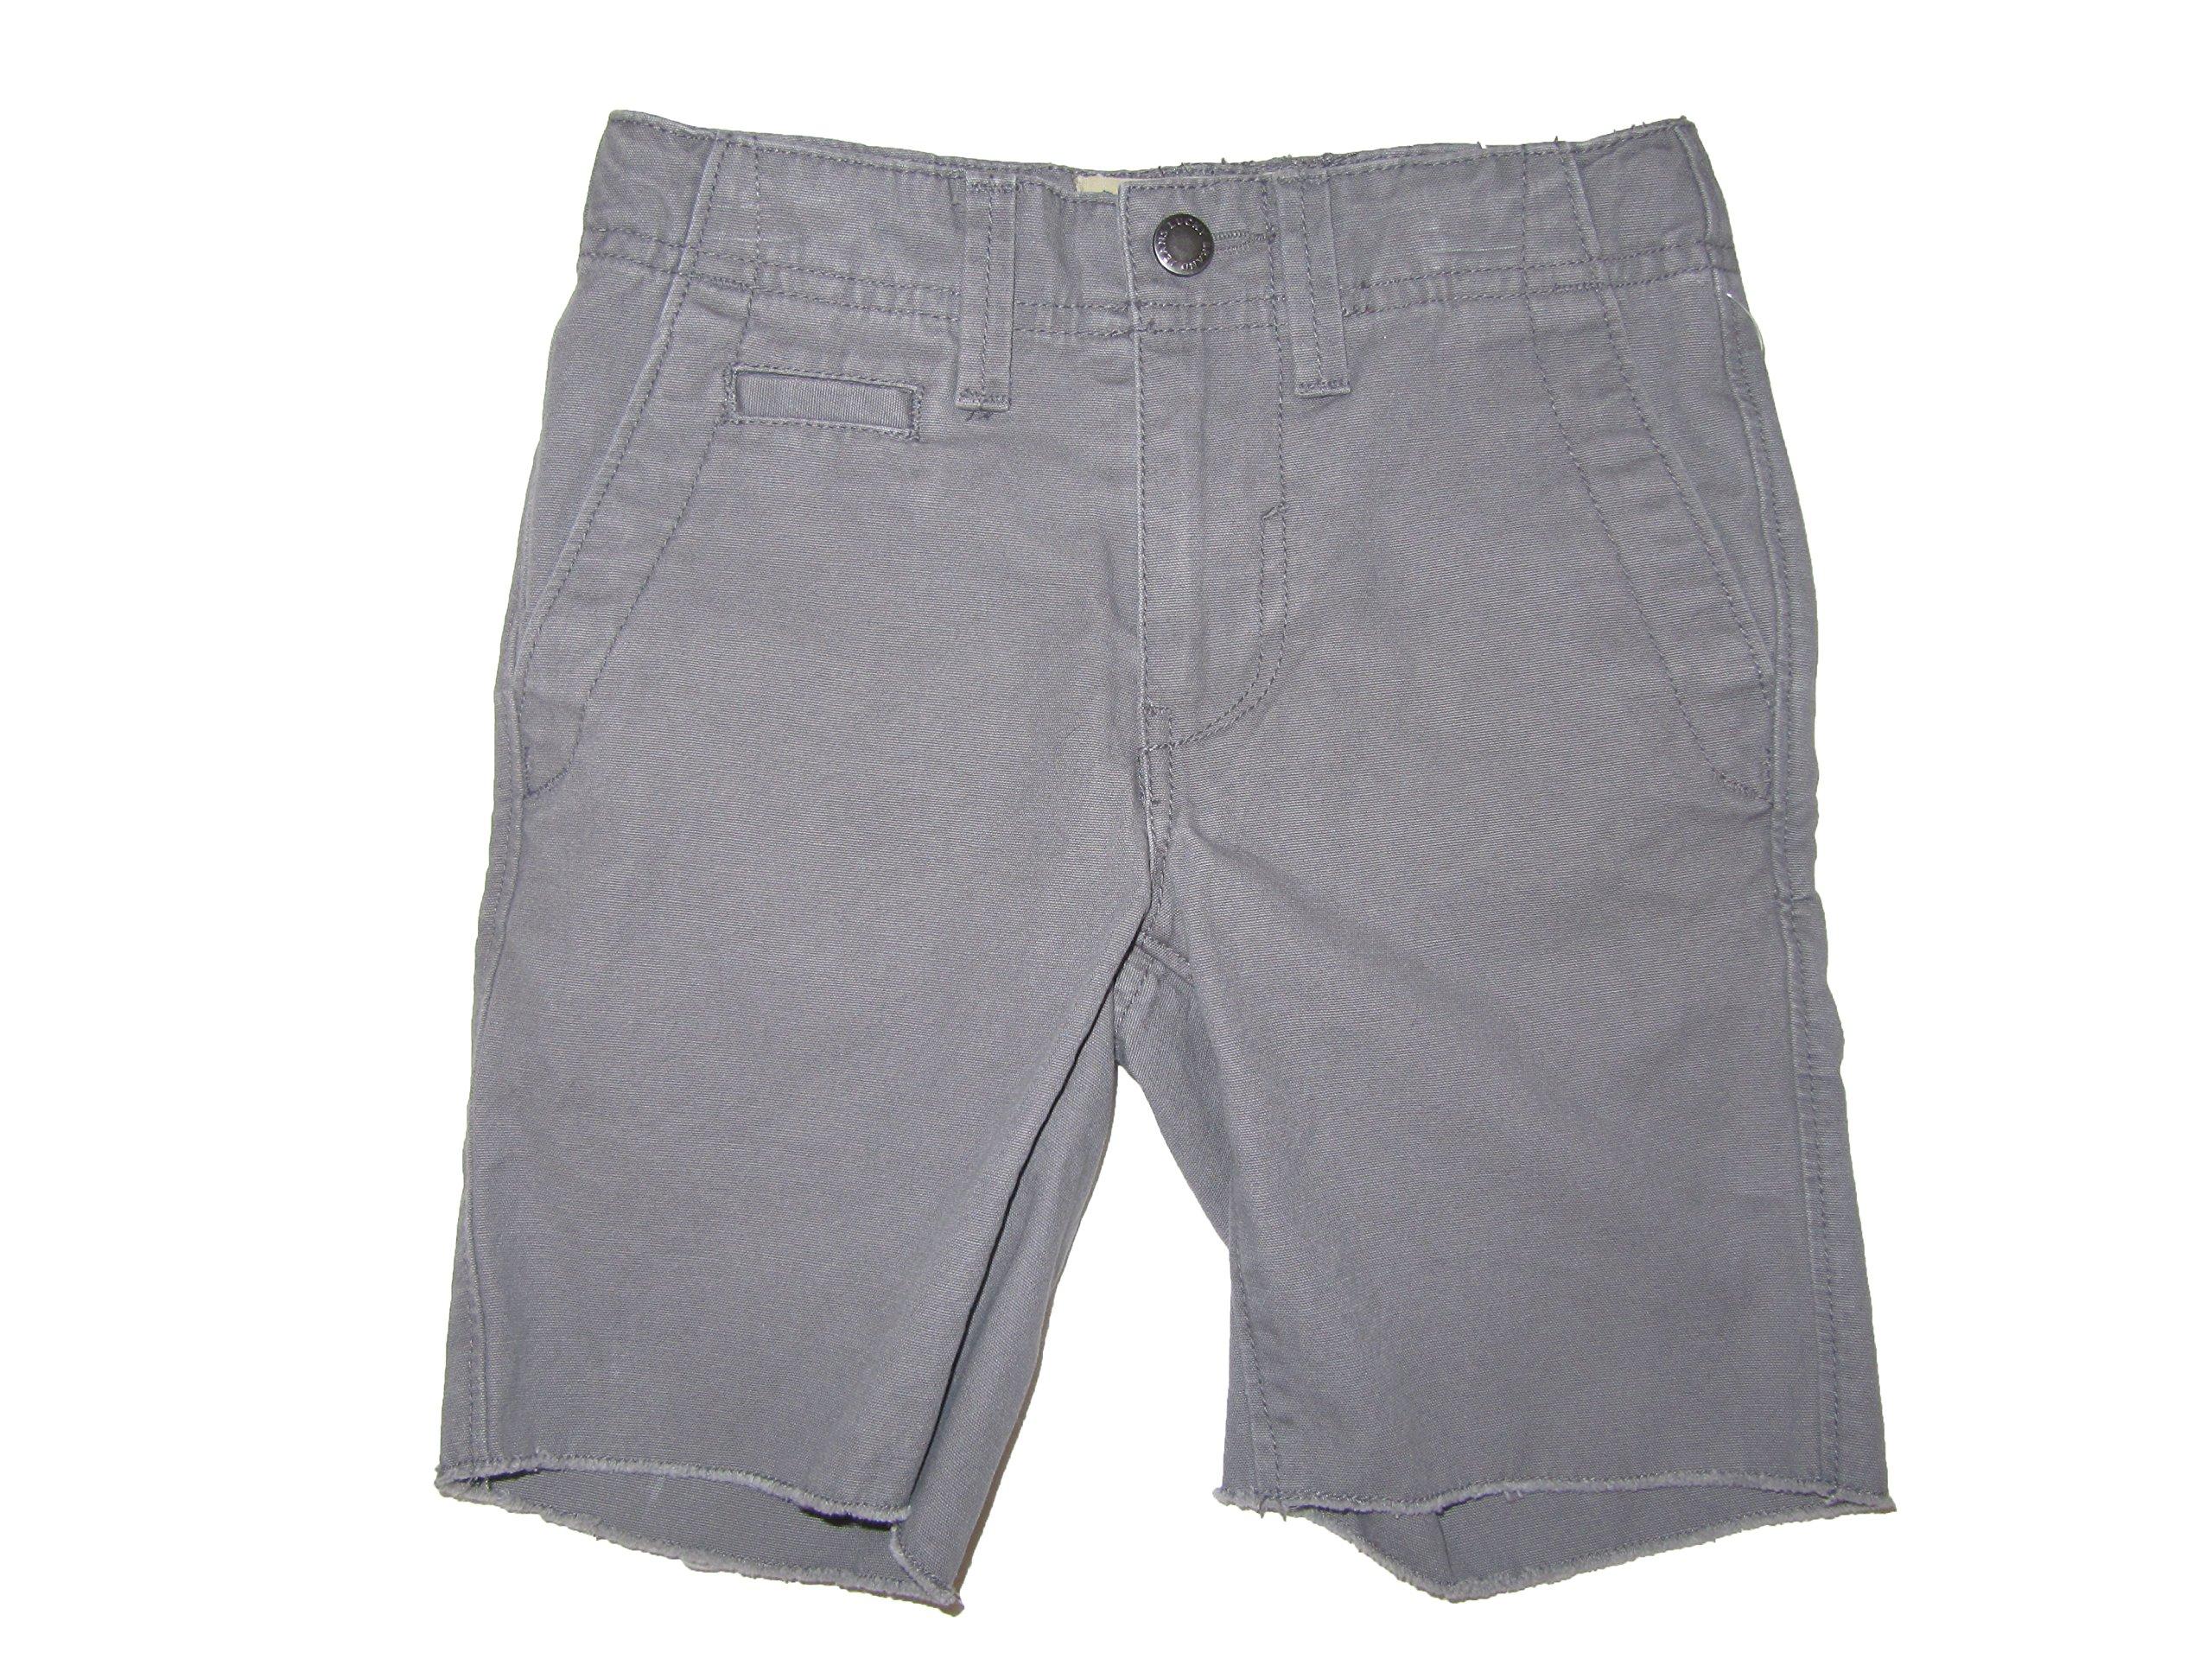 Lucky Brand Cut Off Shorts Boys Size 5 Grey